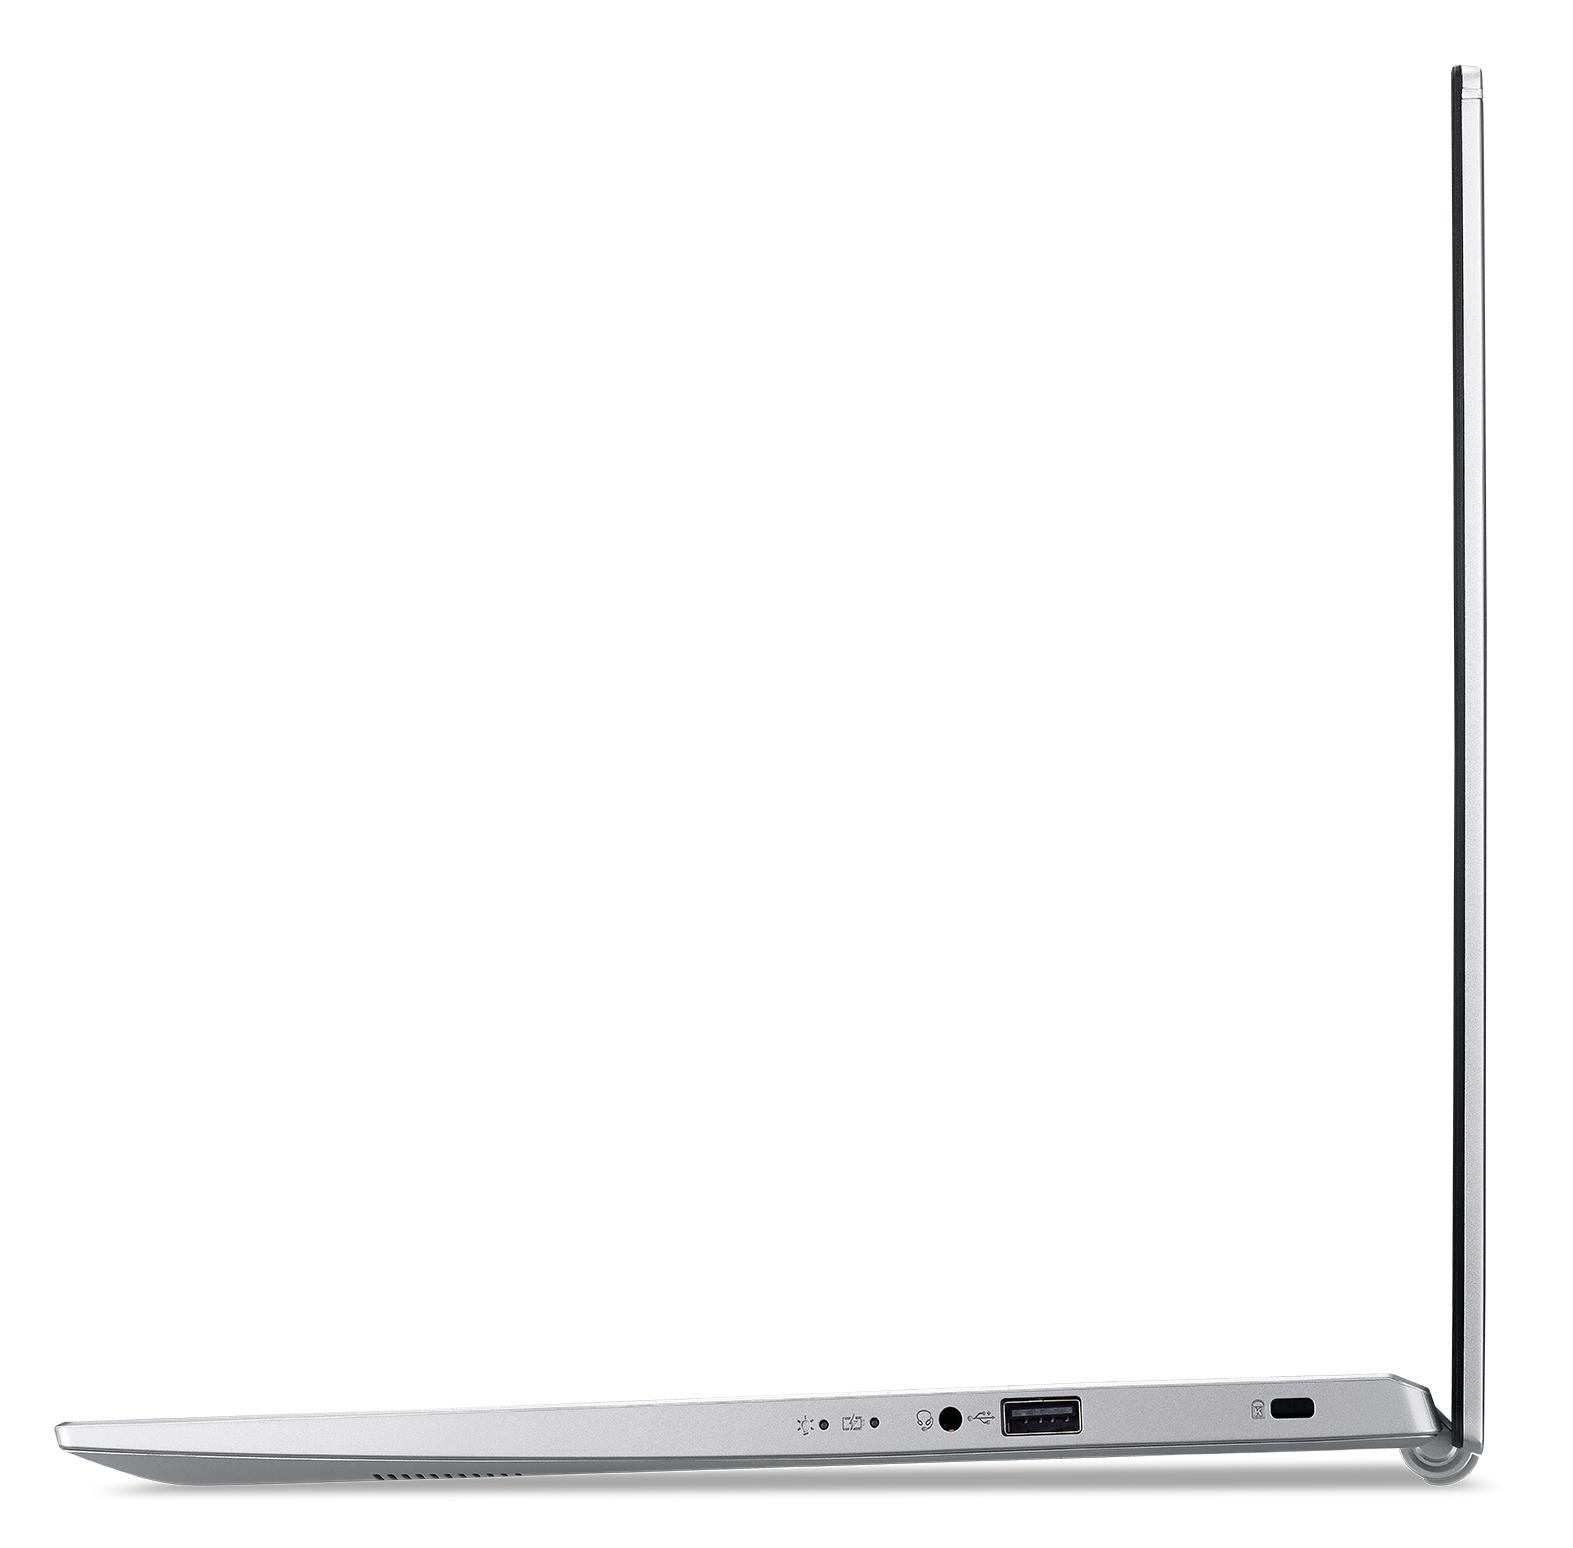 Acer Aspire 5 Pro A517-52-57FS, 17.3inch FHD, i5-1135G7, 16GB, 512GB SSD, Intel Iris Xe Graphics, No ODD, Wi-Fi 6 AX 201 (2x2) + BT 5, Win10 Pro, Qwerty, Silver